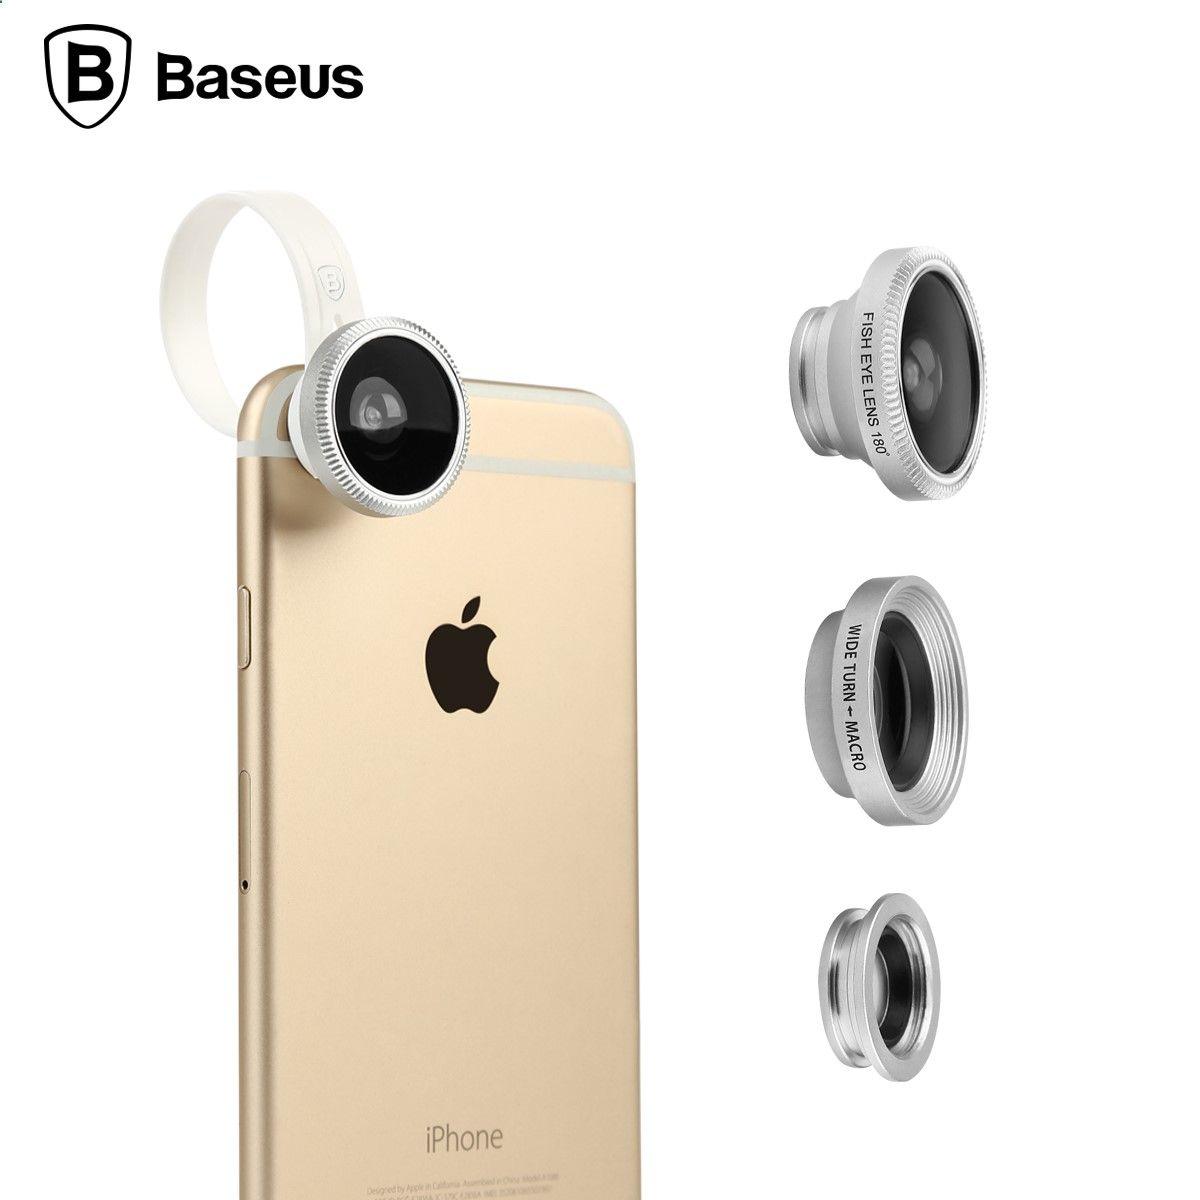 Baseus 3 in 1 mini clipon mobile phone lenses 180 degree